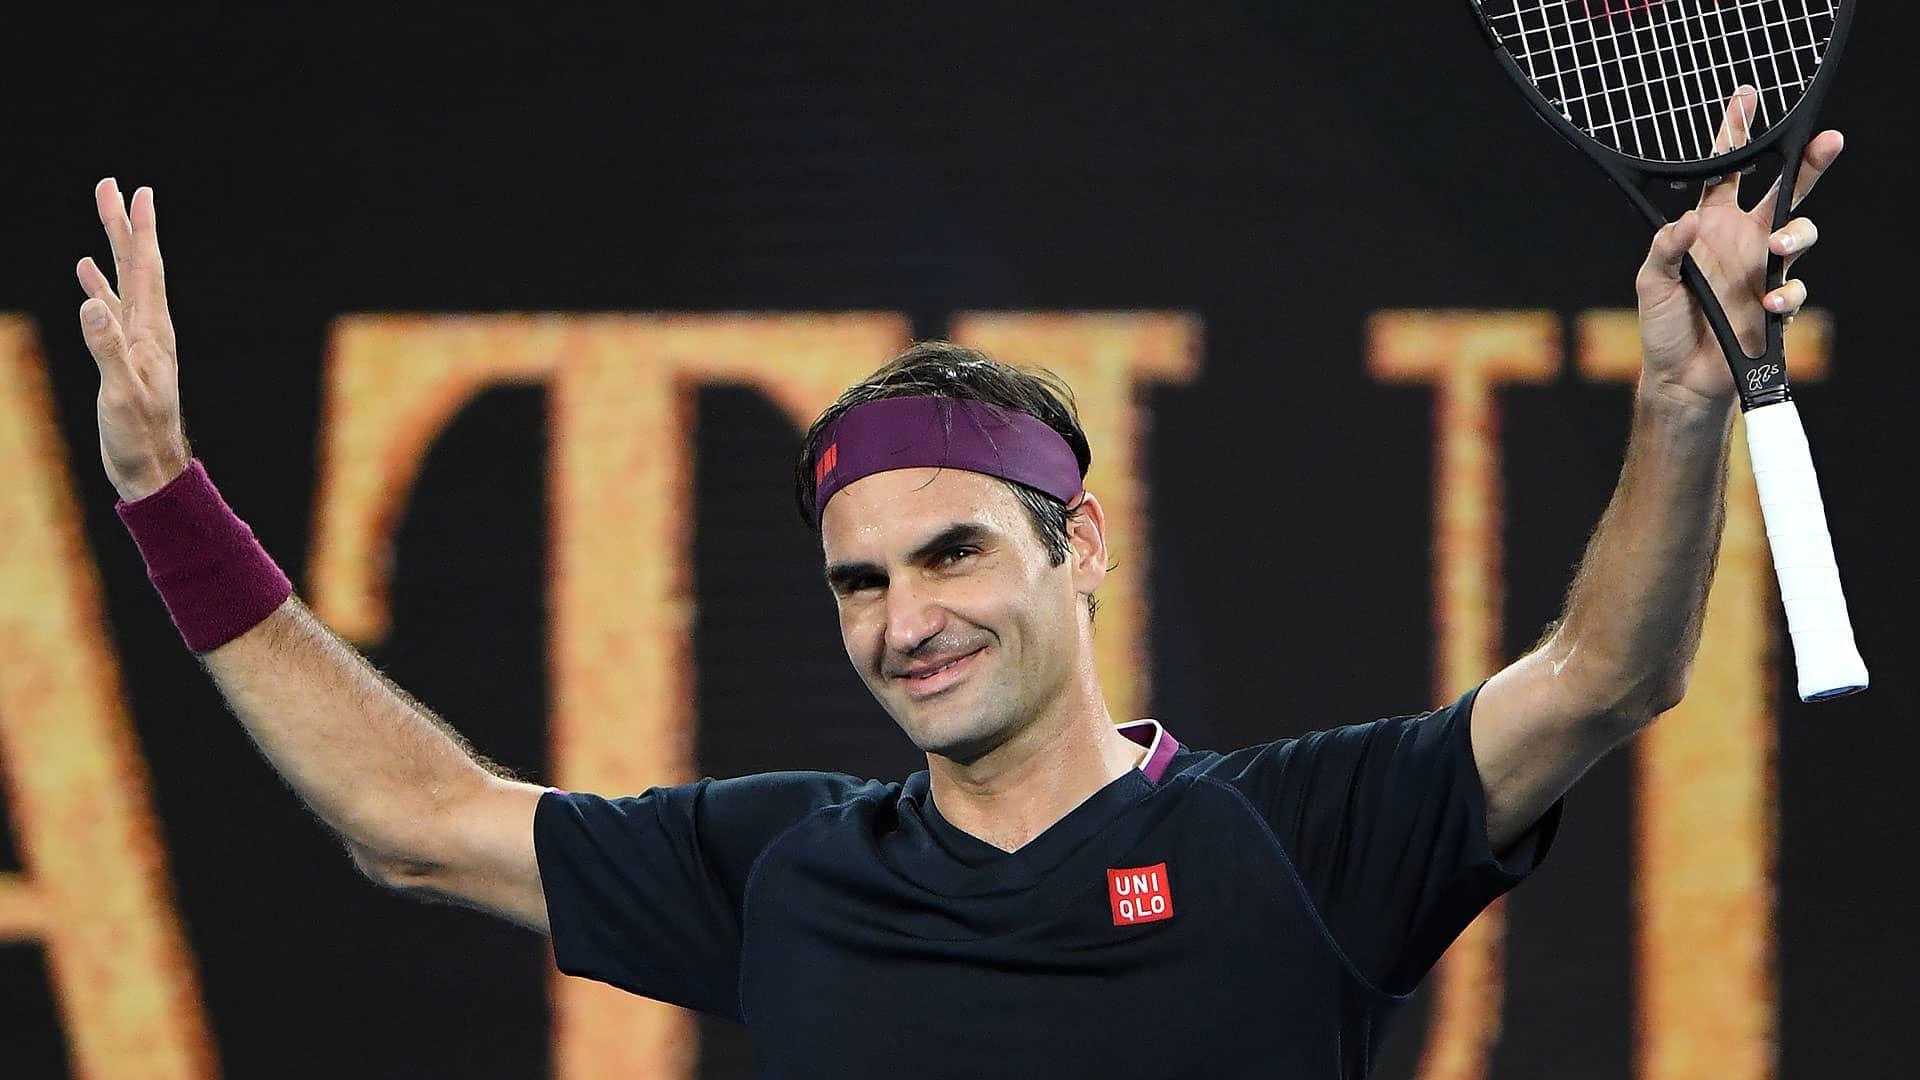 Roger Federer I M Not An Artist Or A Musician